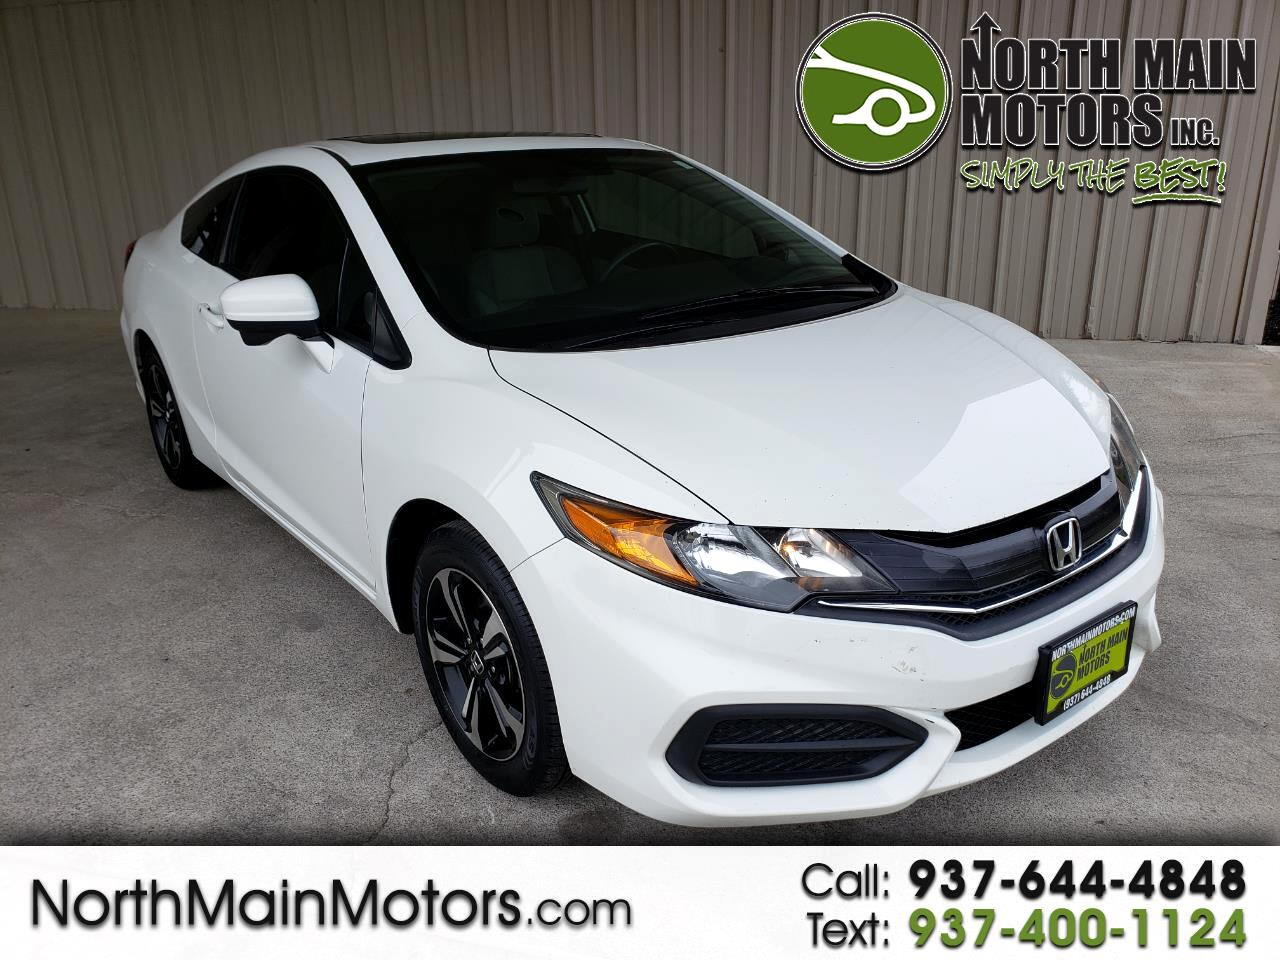 2014 Honda Civic Coupe 2dr CVT EX